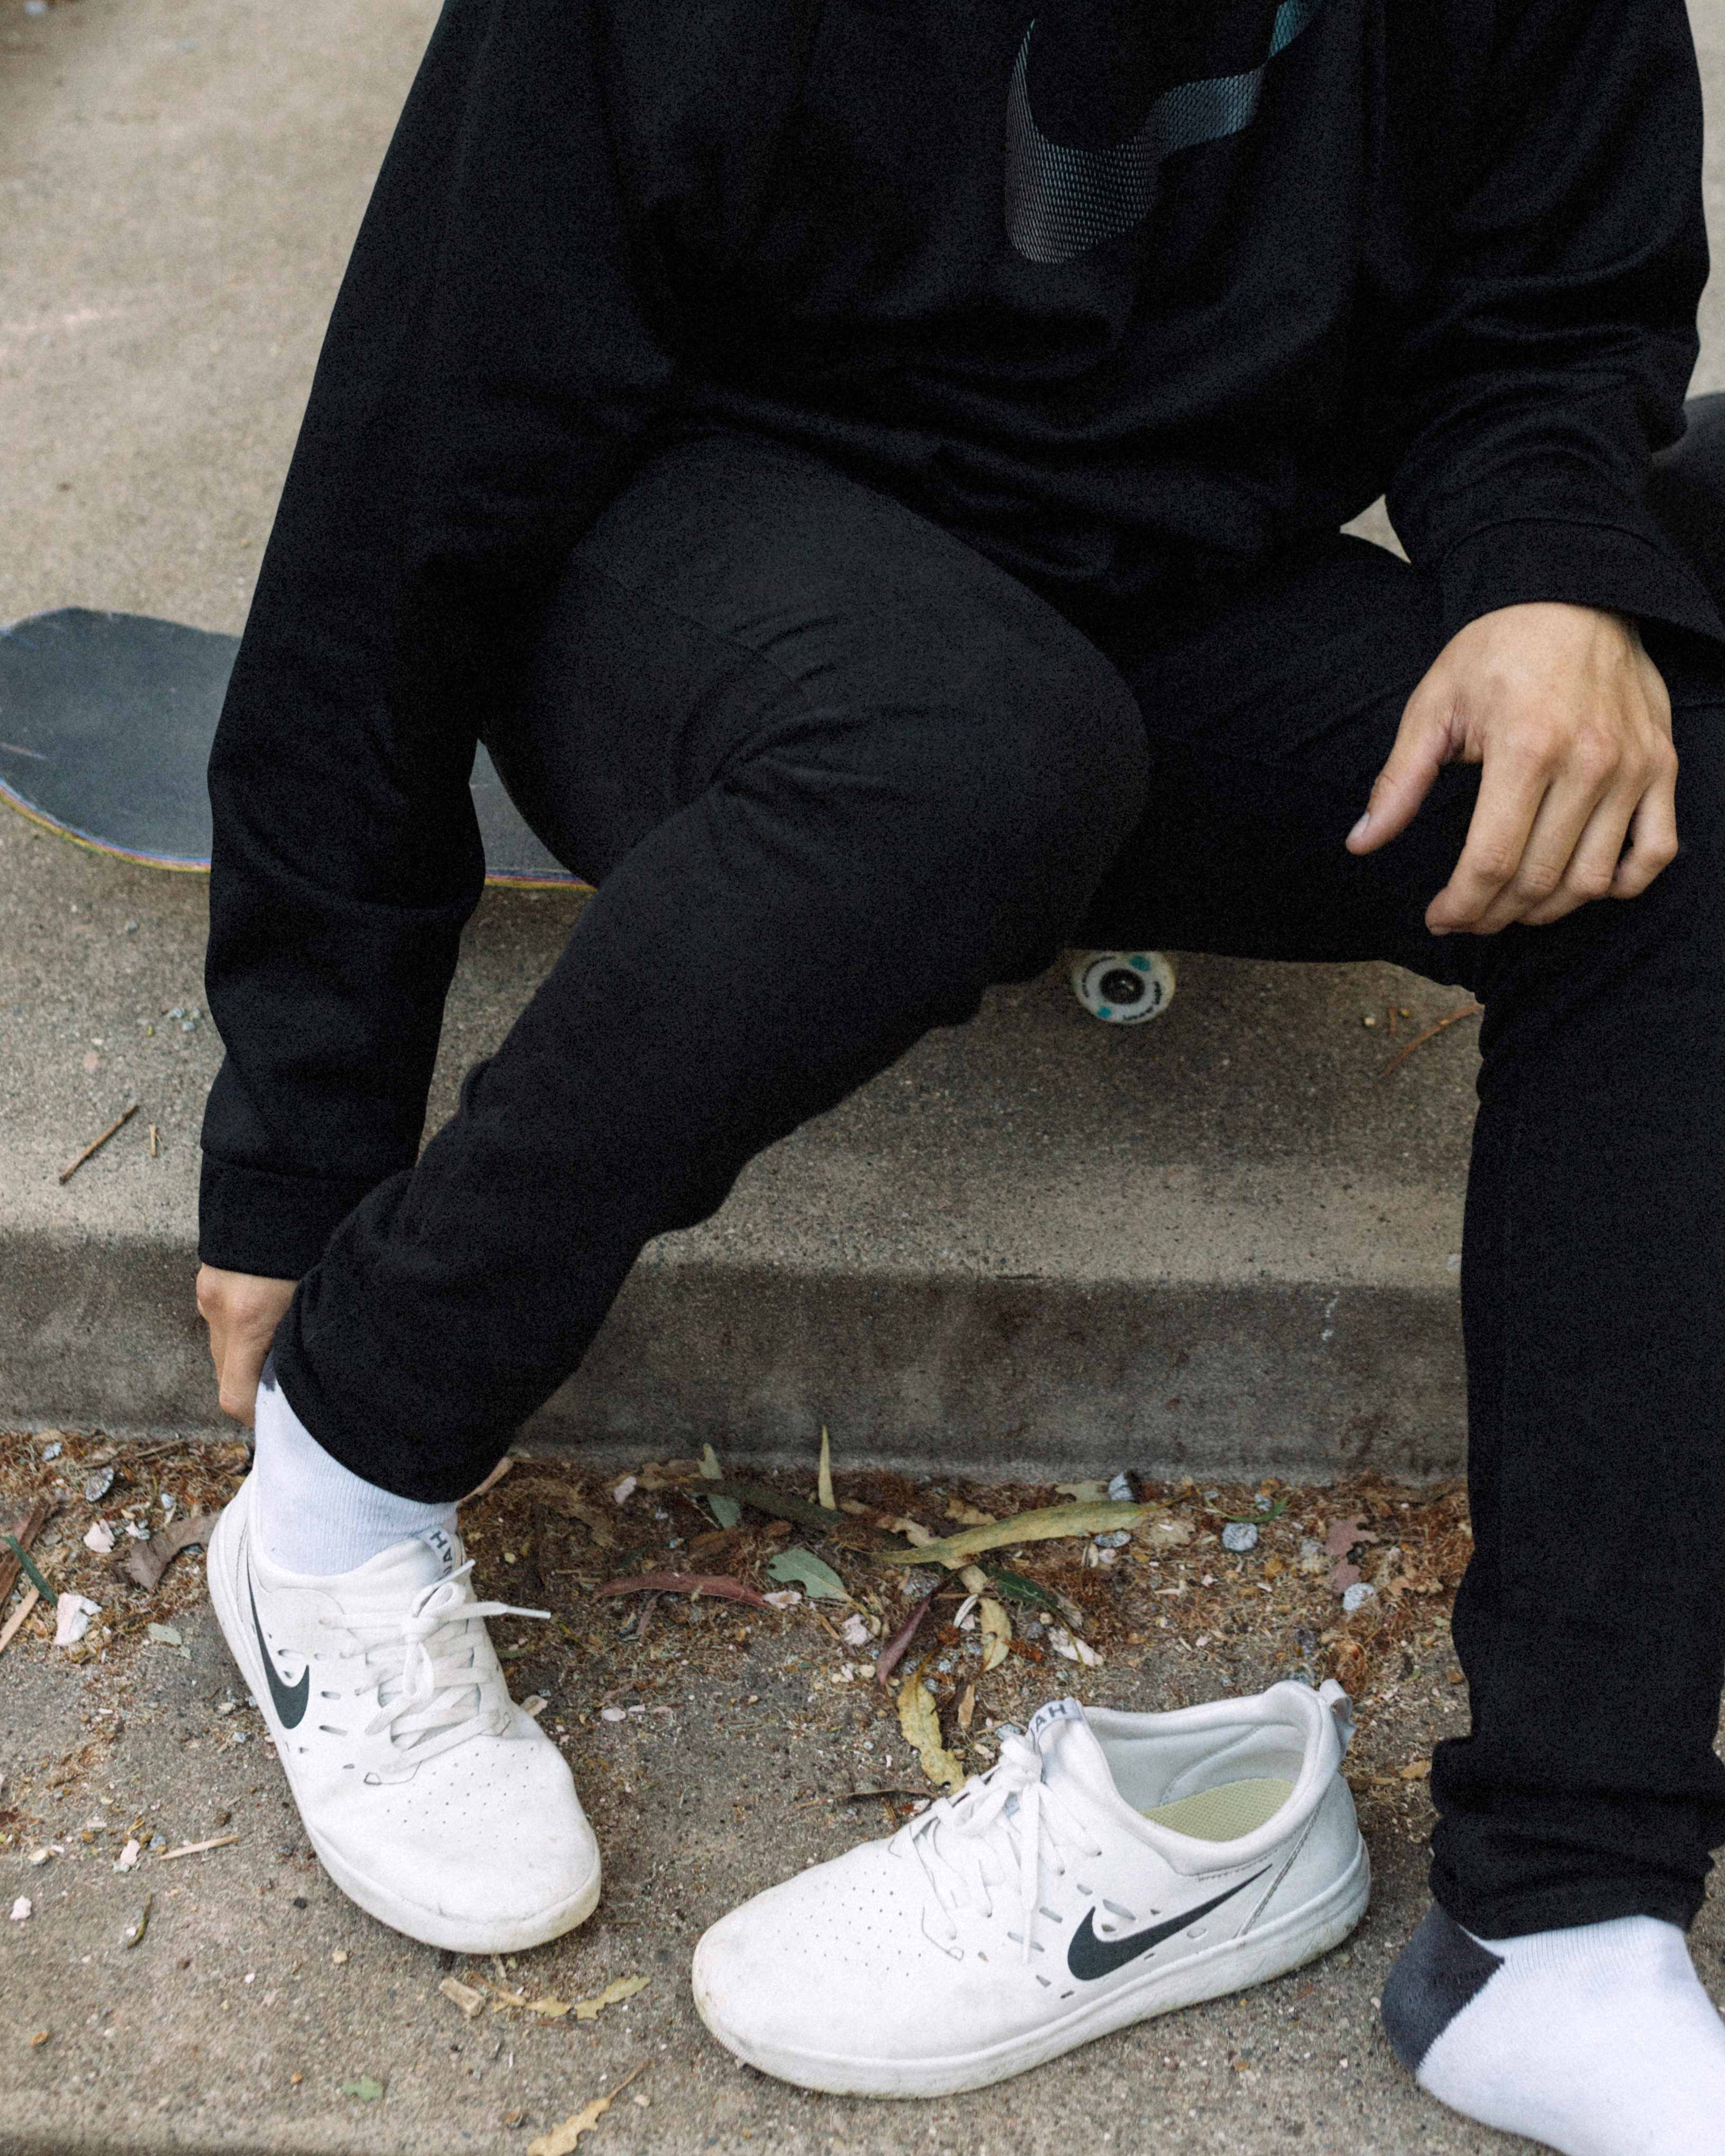 Nike SB release the first Nyjah Huston